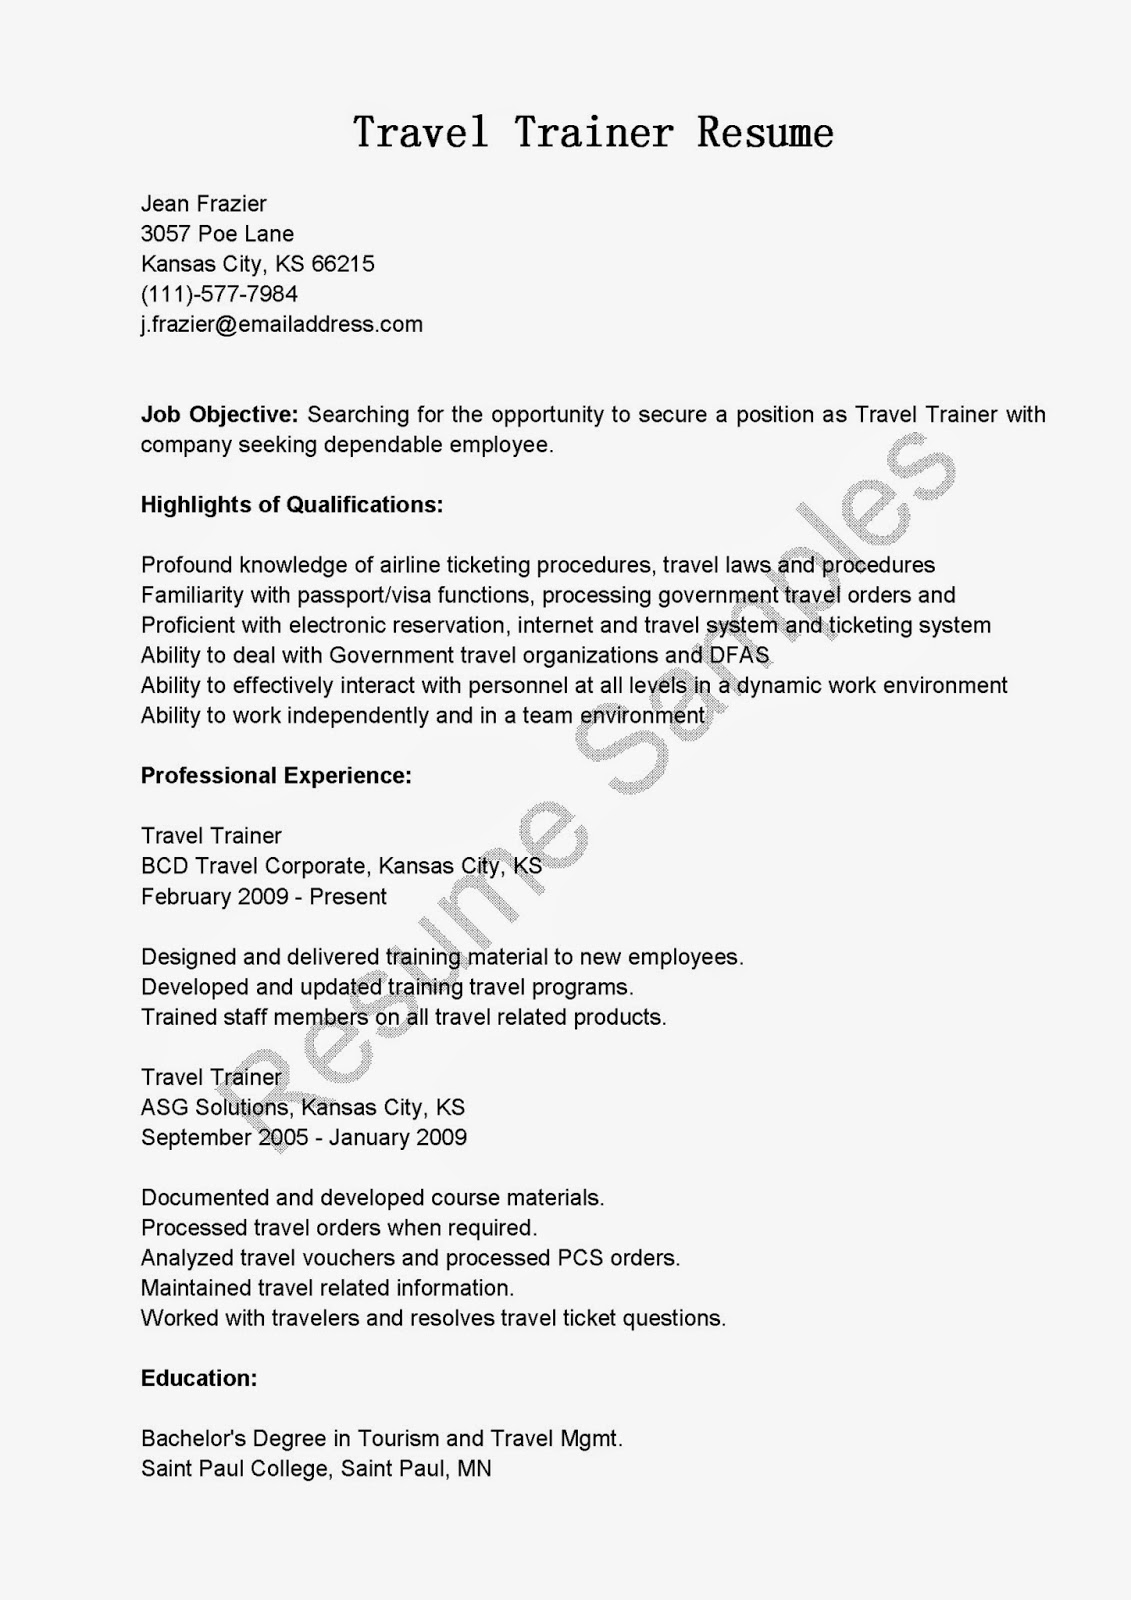 resume samples  travel trainer resume sample